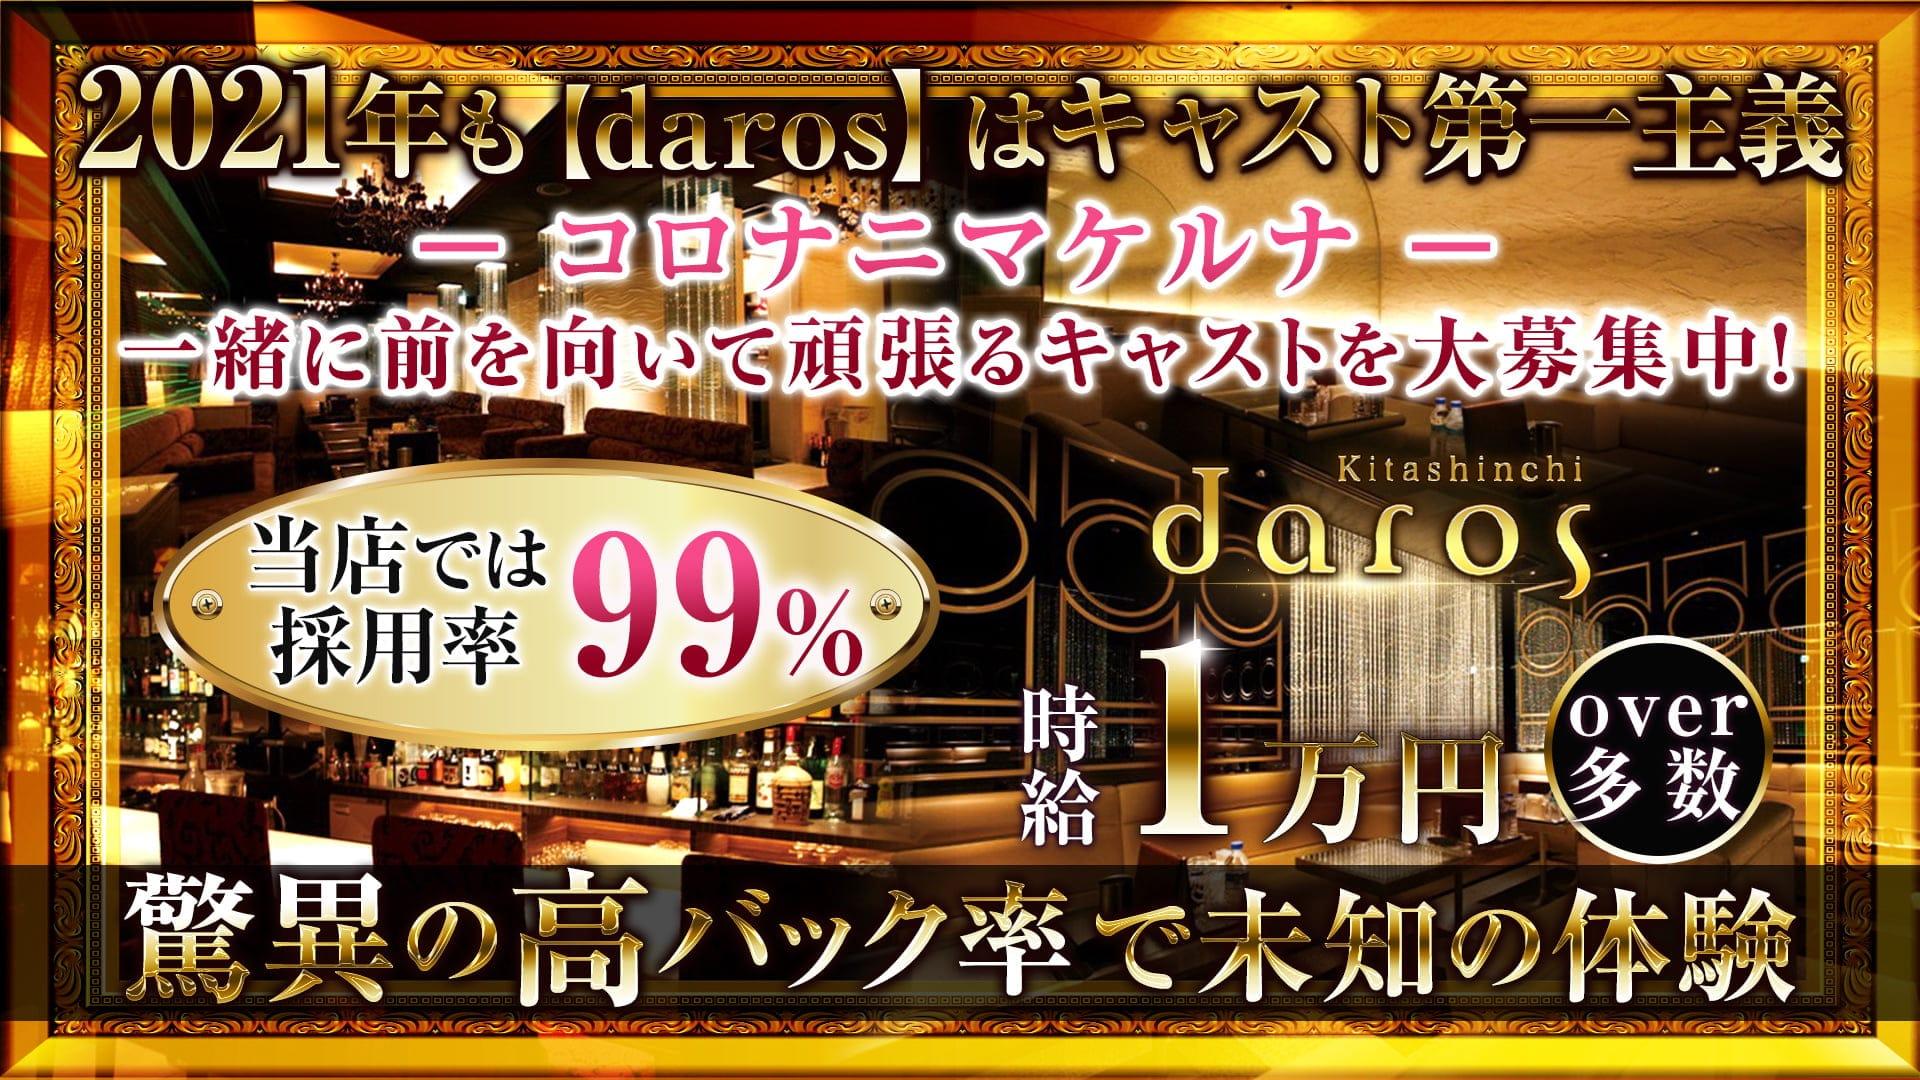 daros(ダーロス) 北新地【公式求人・体入情報】 北新地キャバクラ TOP画像